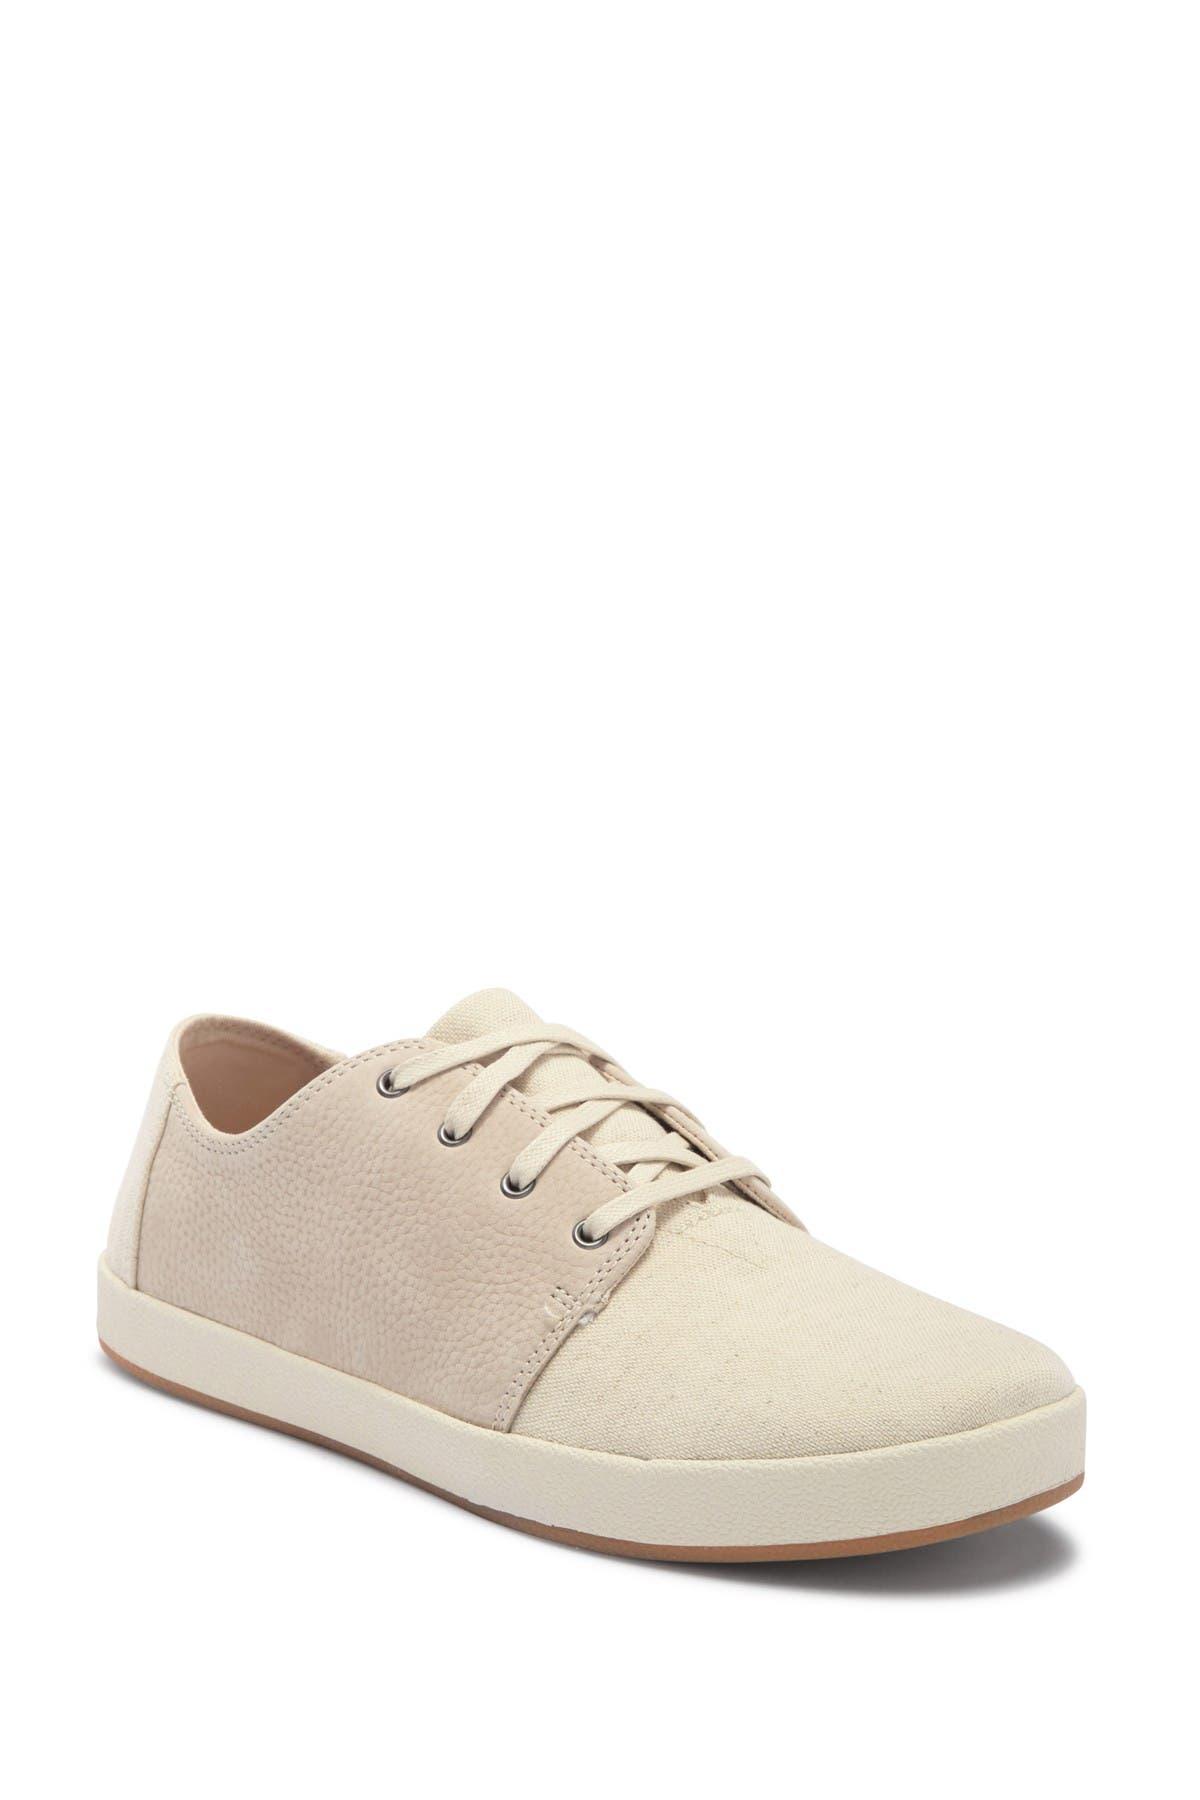 TOMS   Payton Leather Sneaker